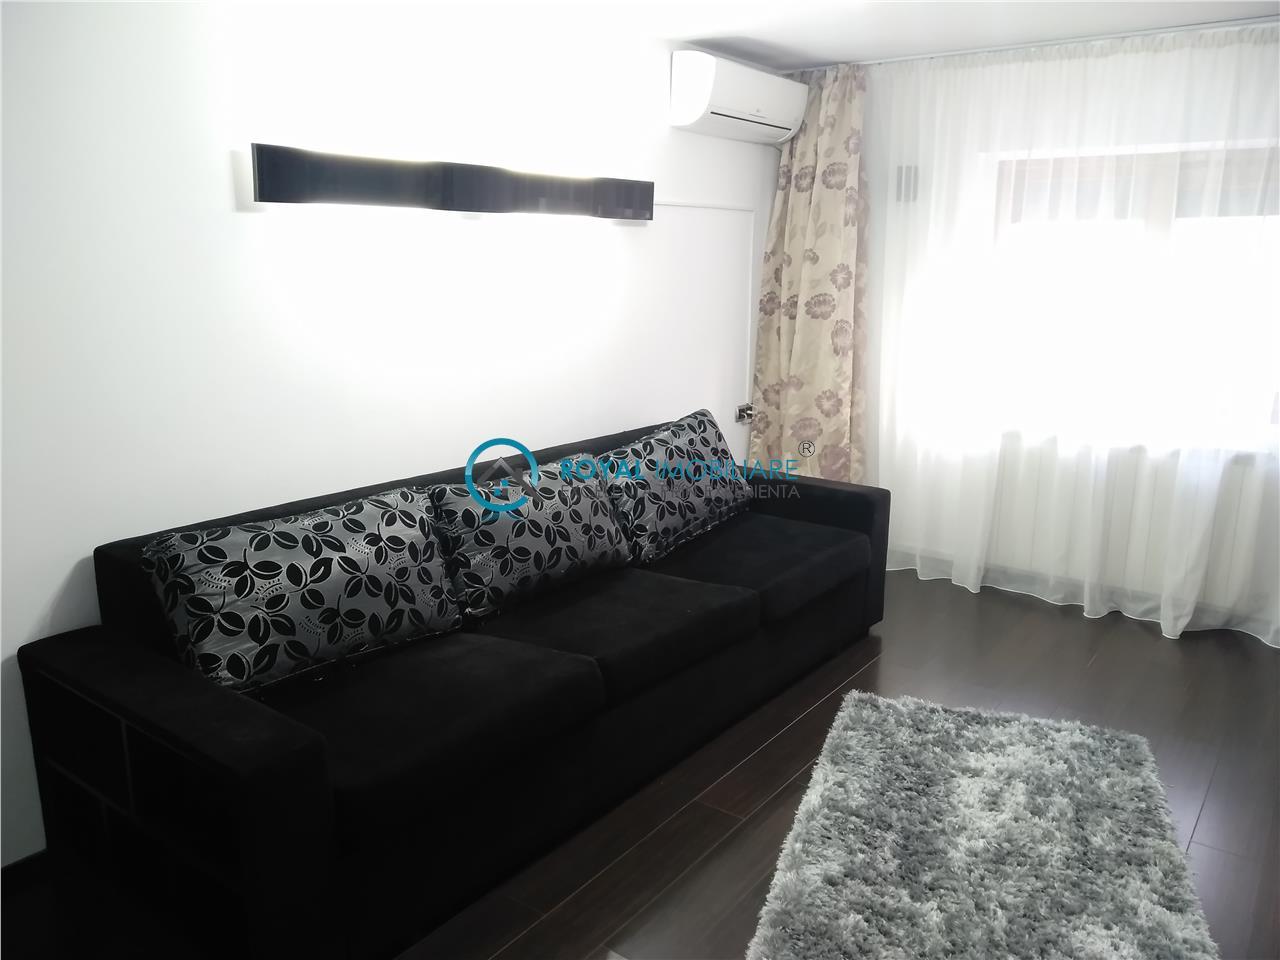 Royal Imobiliare   Inchirieri apartamente Cantacuzino